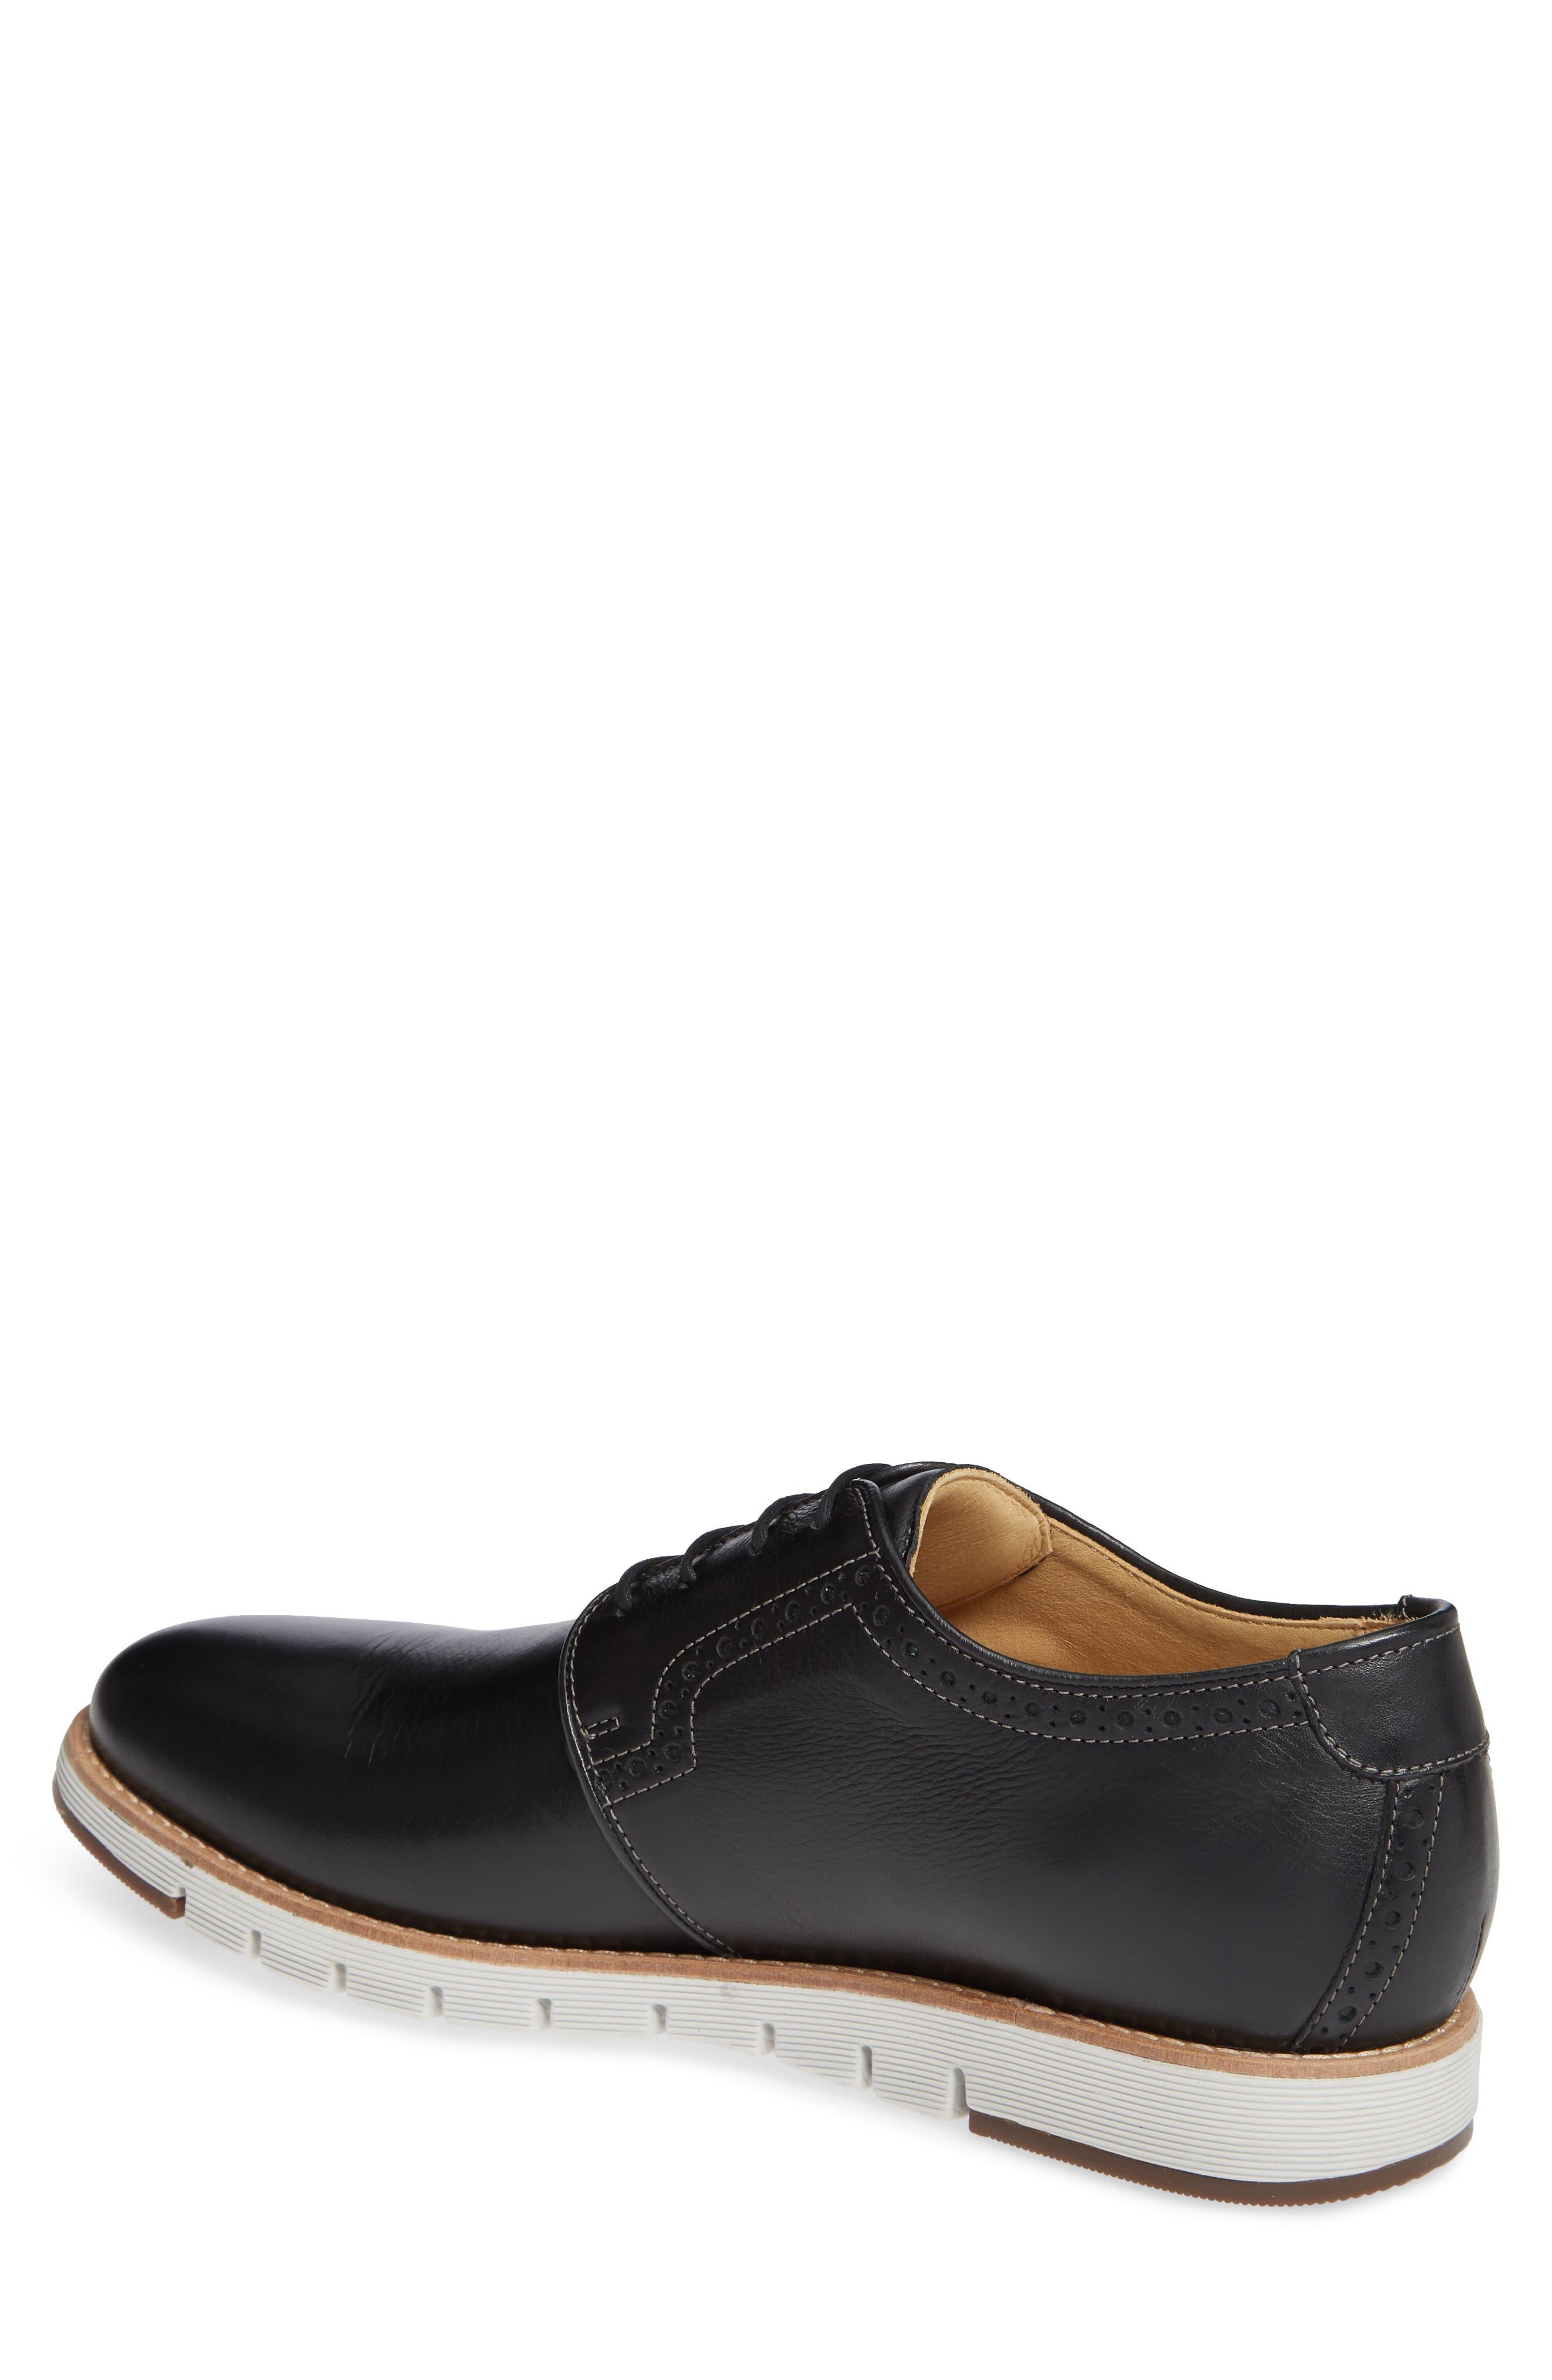 Martell Plain Toe Derby,                             Alternate thumbnail 2, color,                             BLACK LEATHER